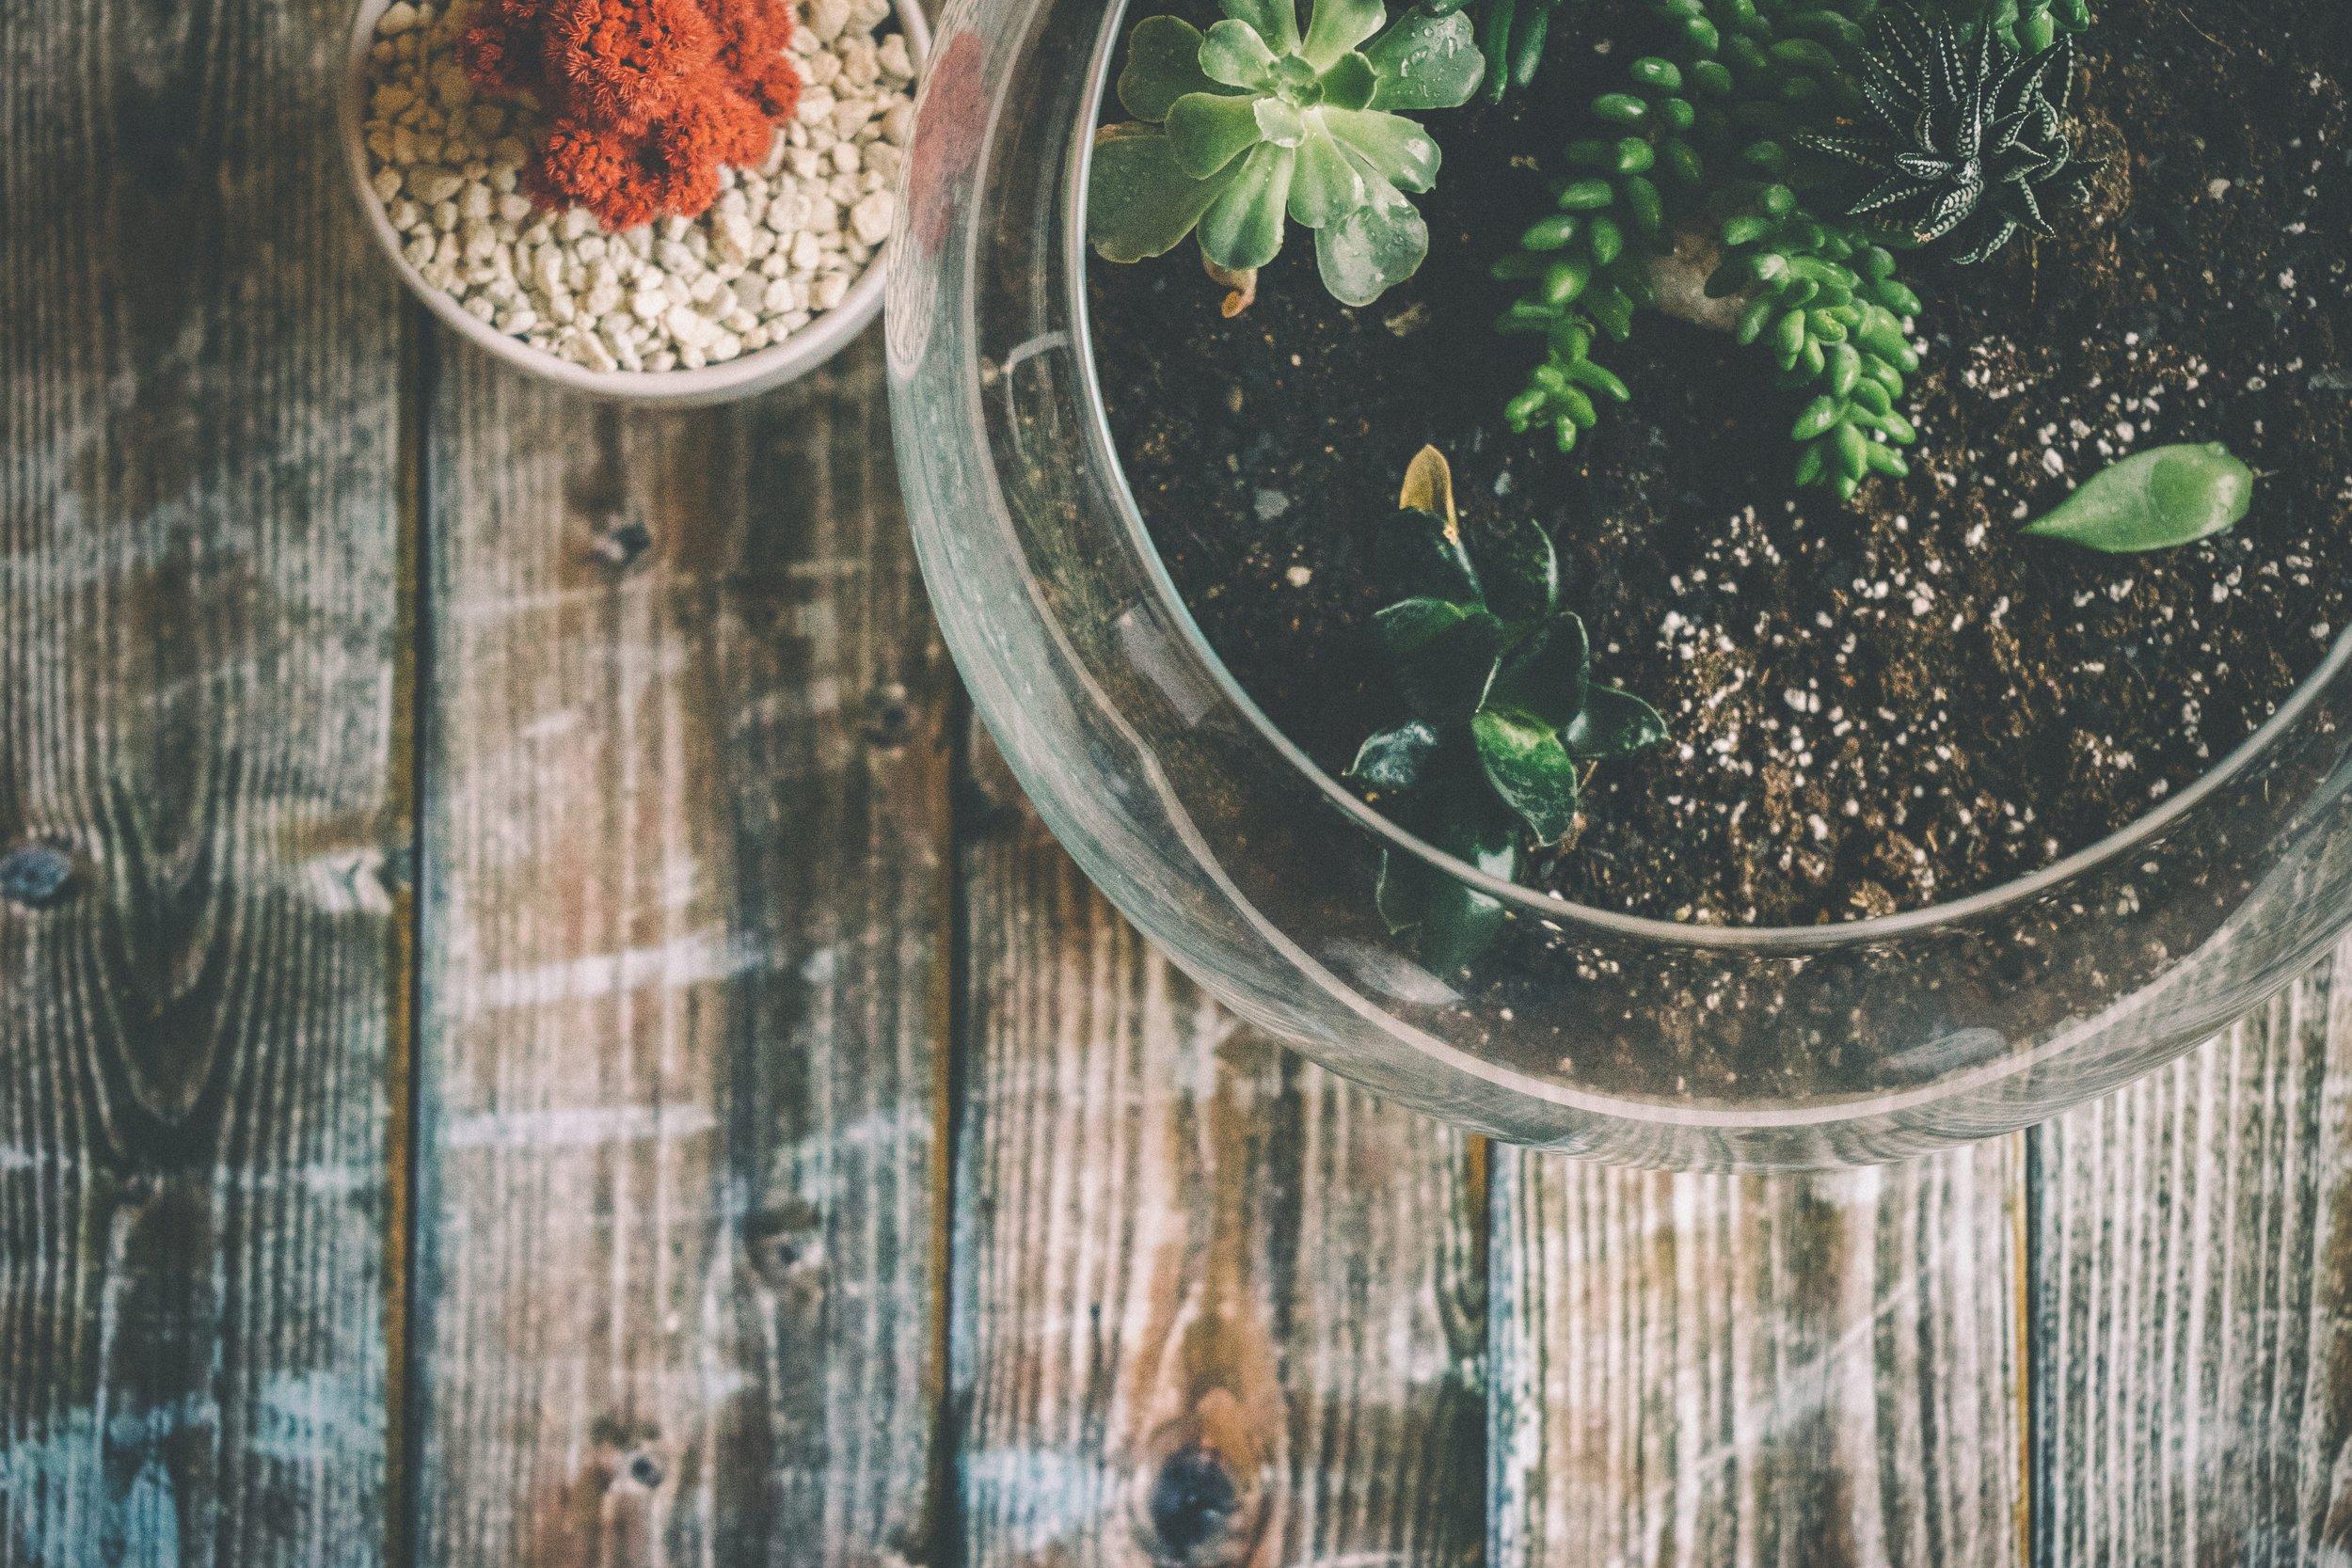 cactus-glass-leaves-185495.jpg